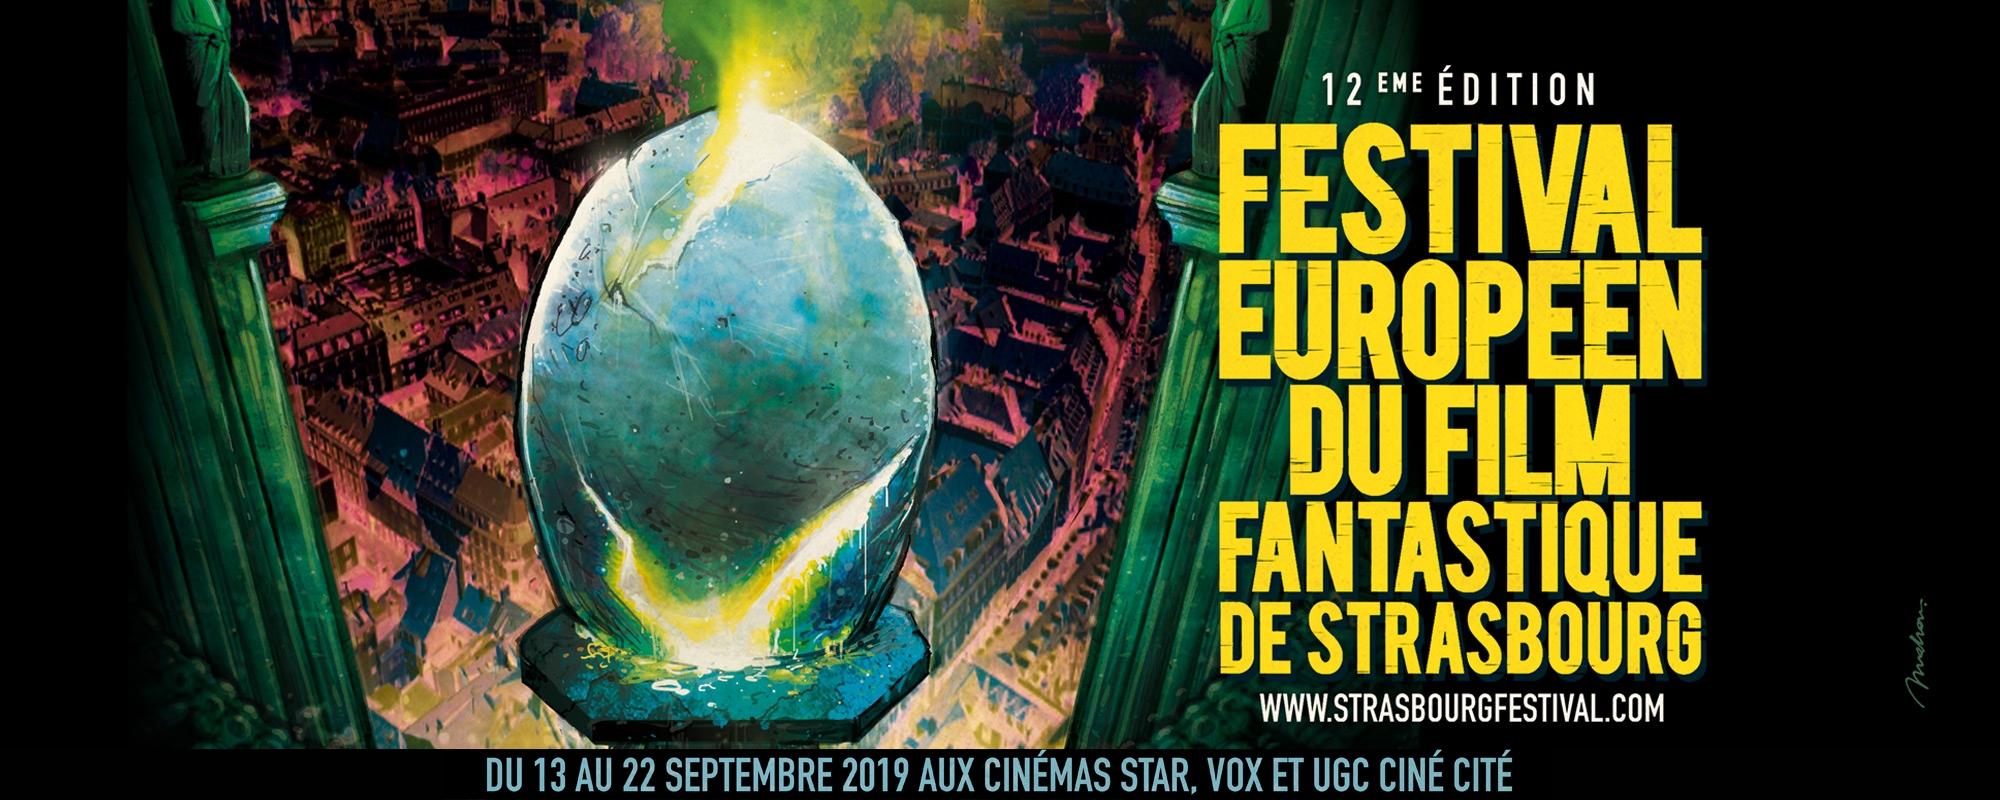 Affiche FEFFS 2019 Alien Ridley Scott